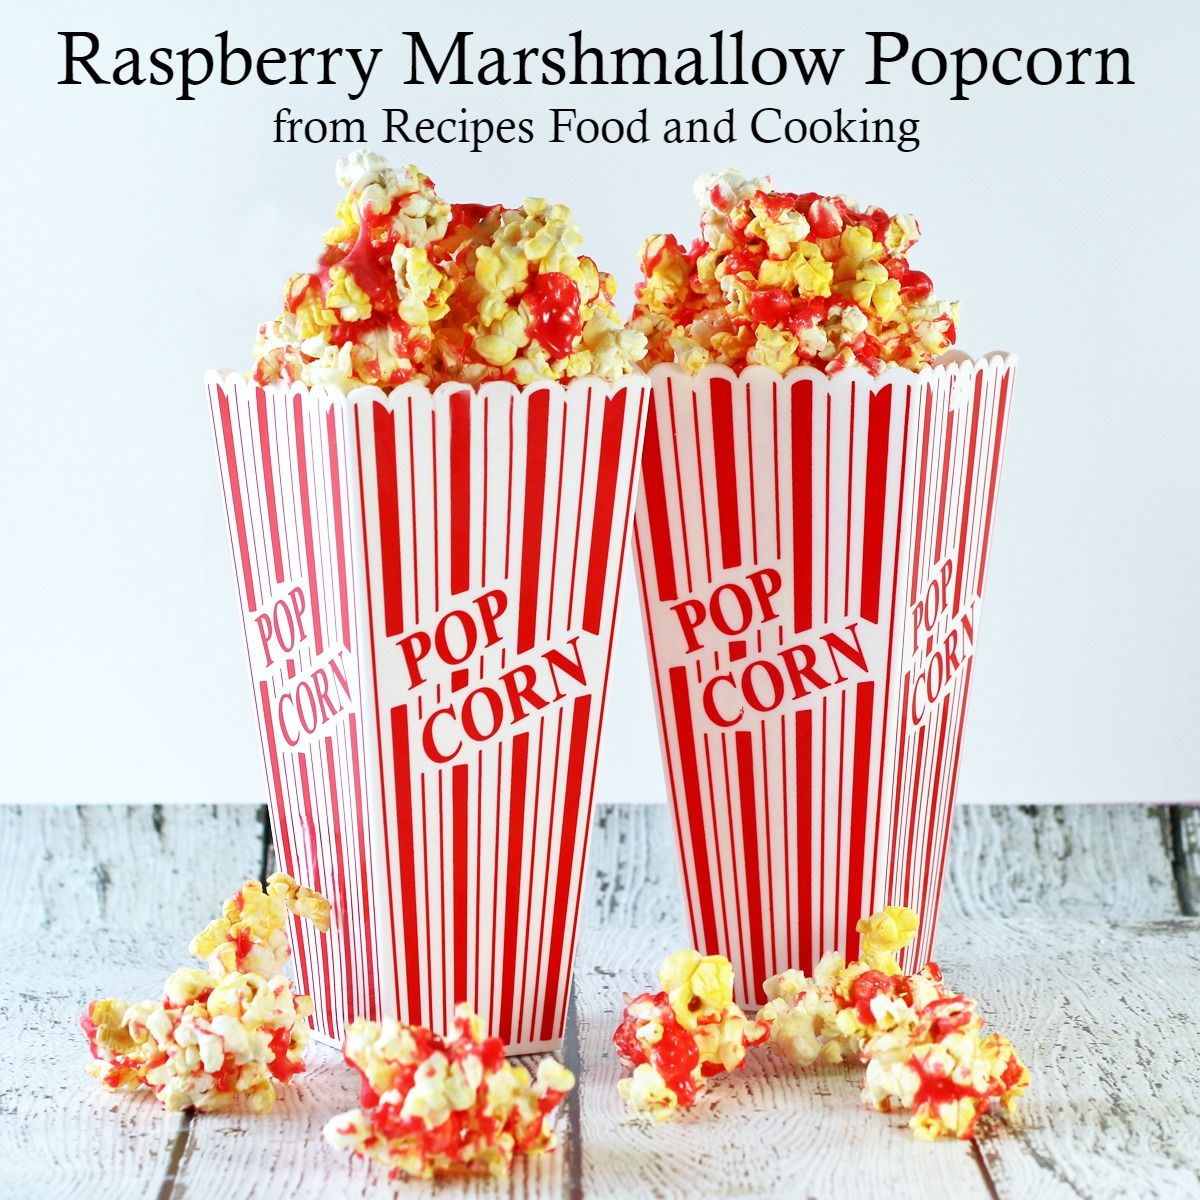 Raspberry Marshmallow Popcorn